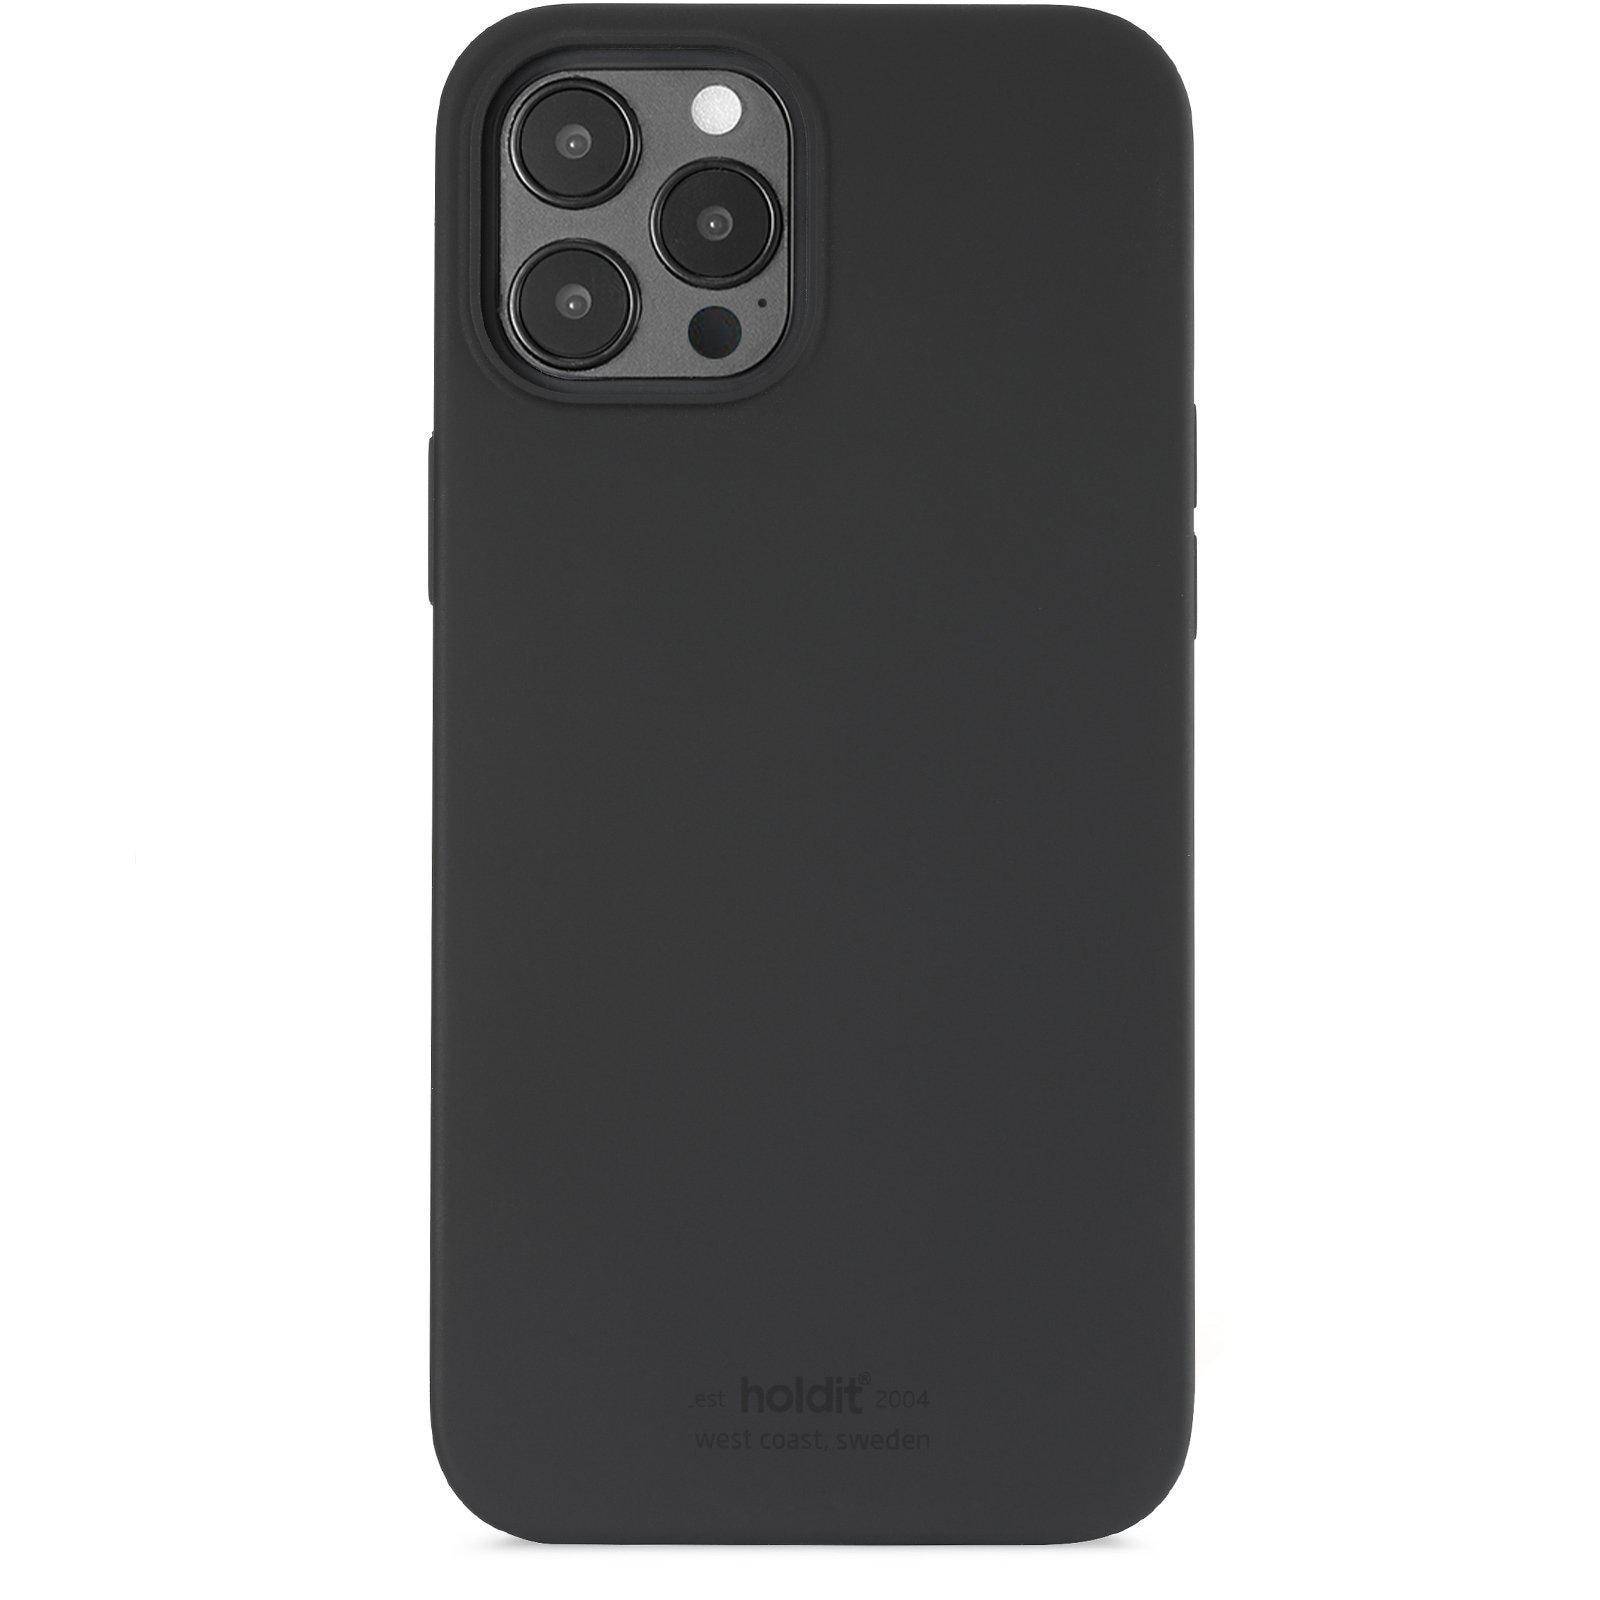 Silikonikuori iPhone 12 Pro Max Musta